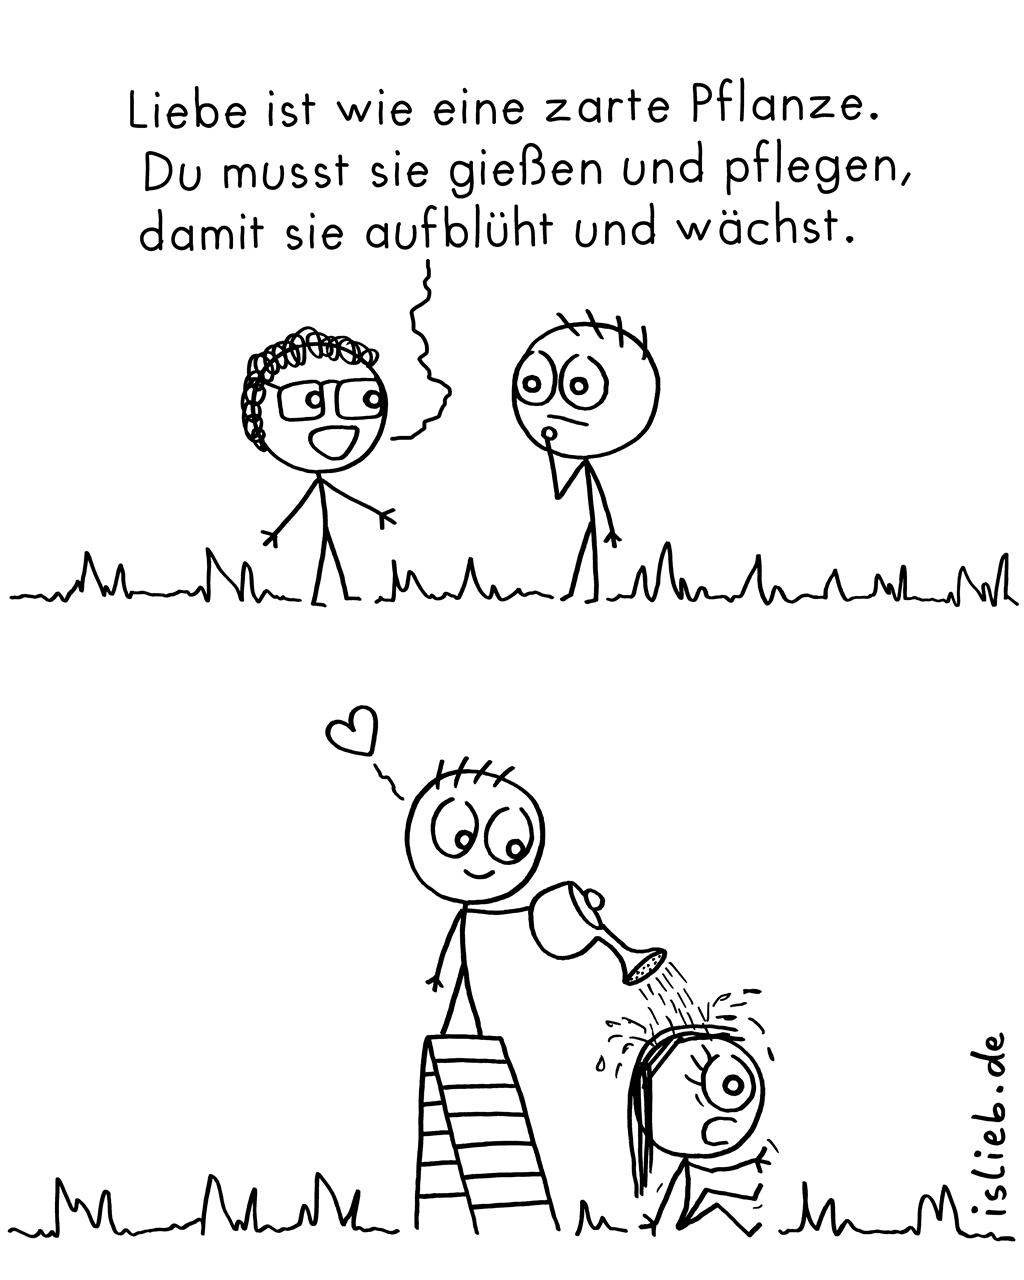 Zarte Pflanze | Liebes-Comic | is lieb?